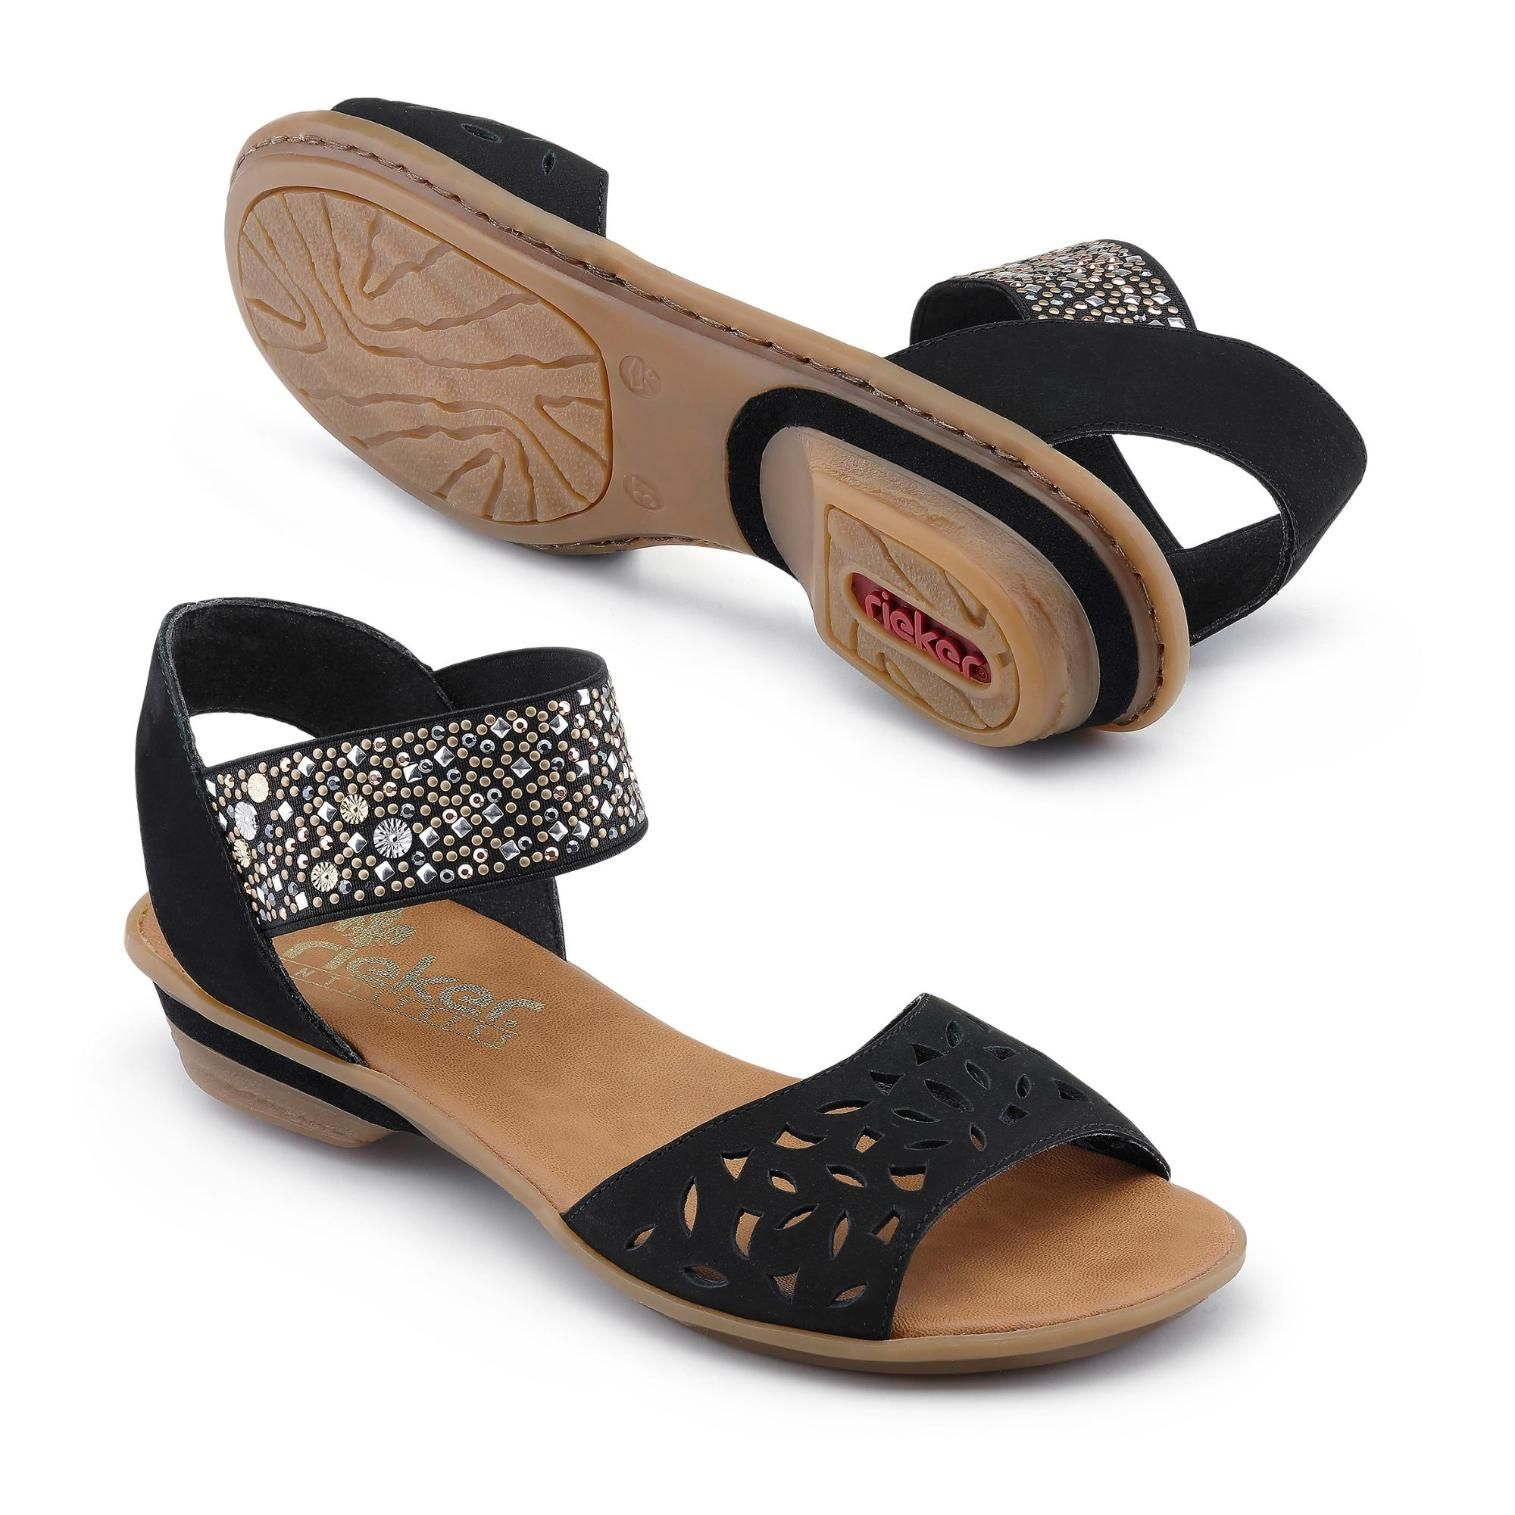 Damen Schwarz Billig Rieker Sandale Sandalen Shoes Sandals Shoe Bag